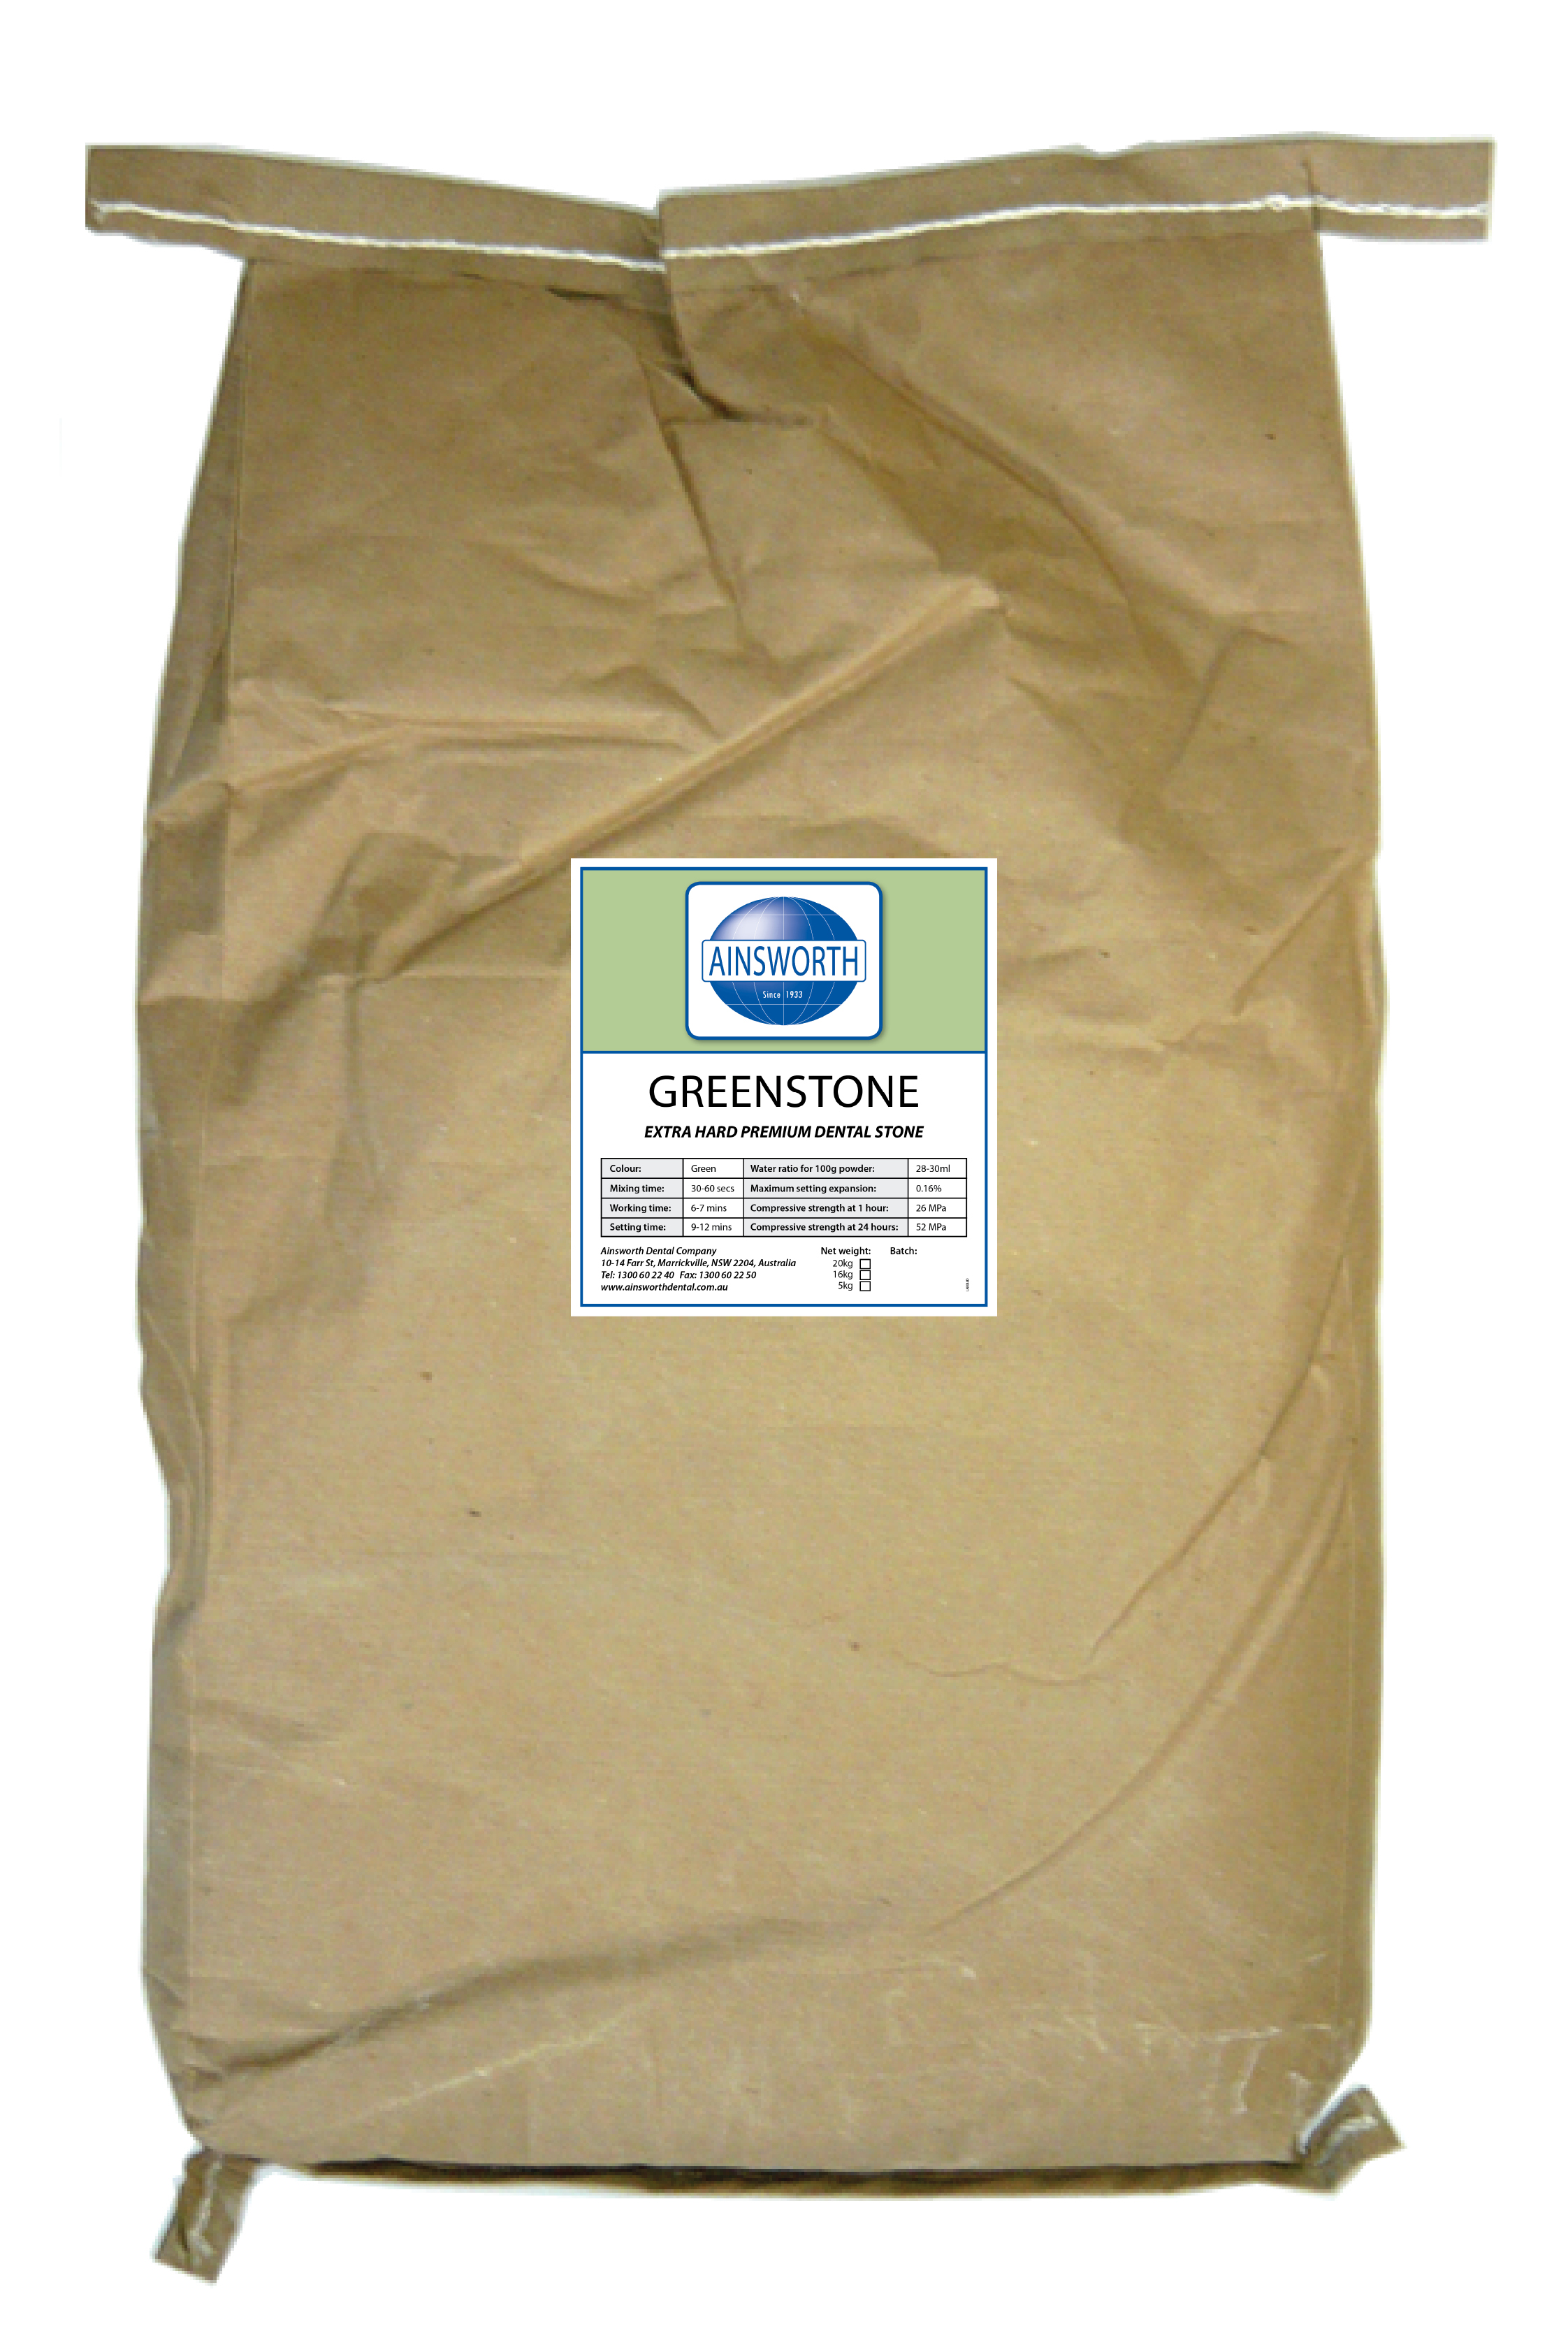 Ainsworth Greenstone 20Kg Bag